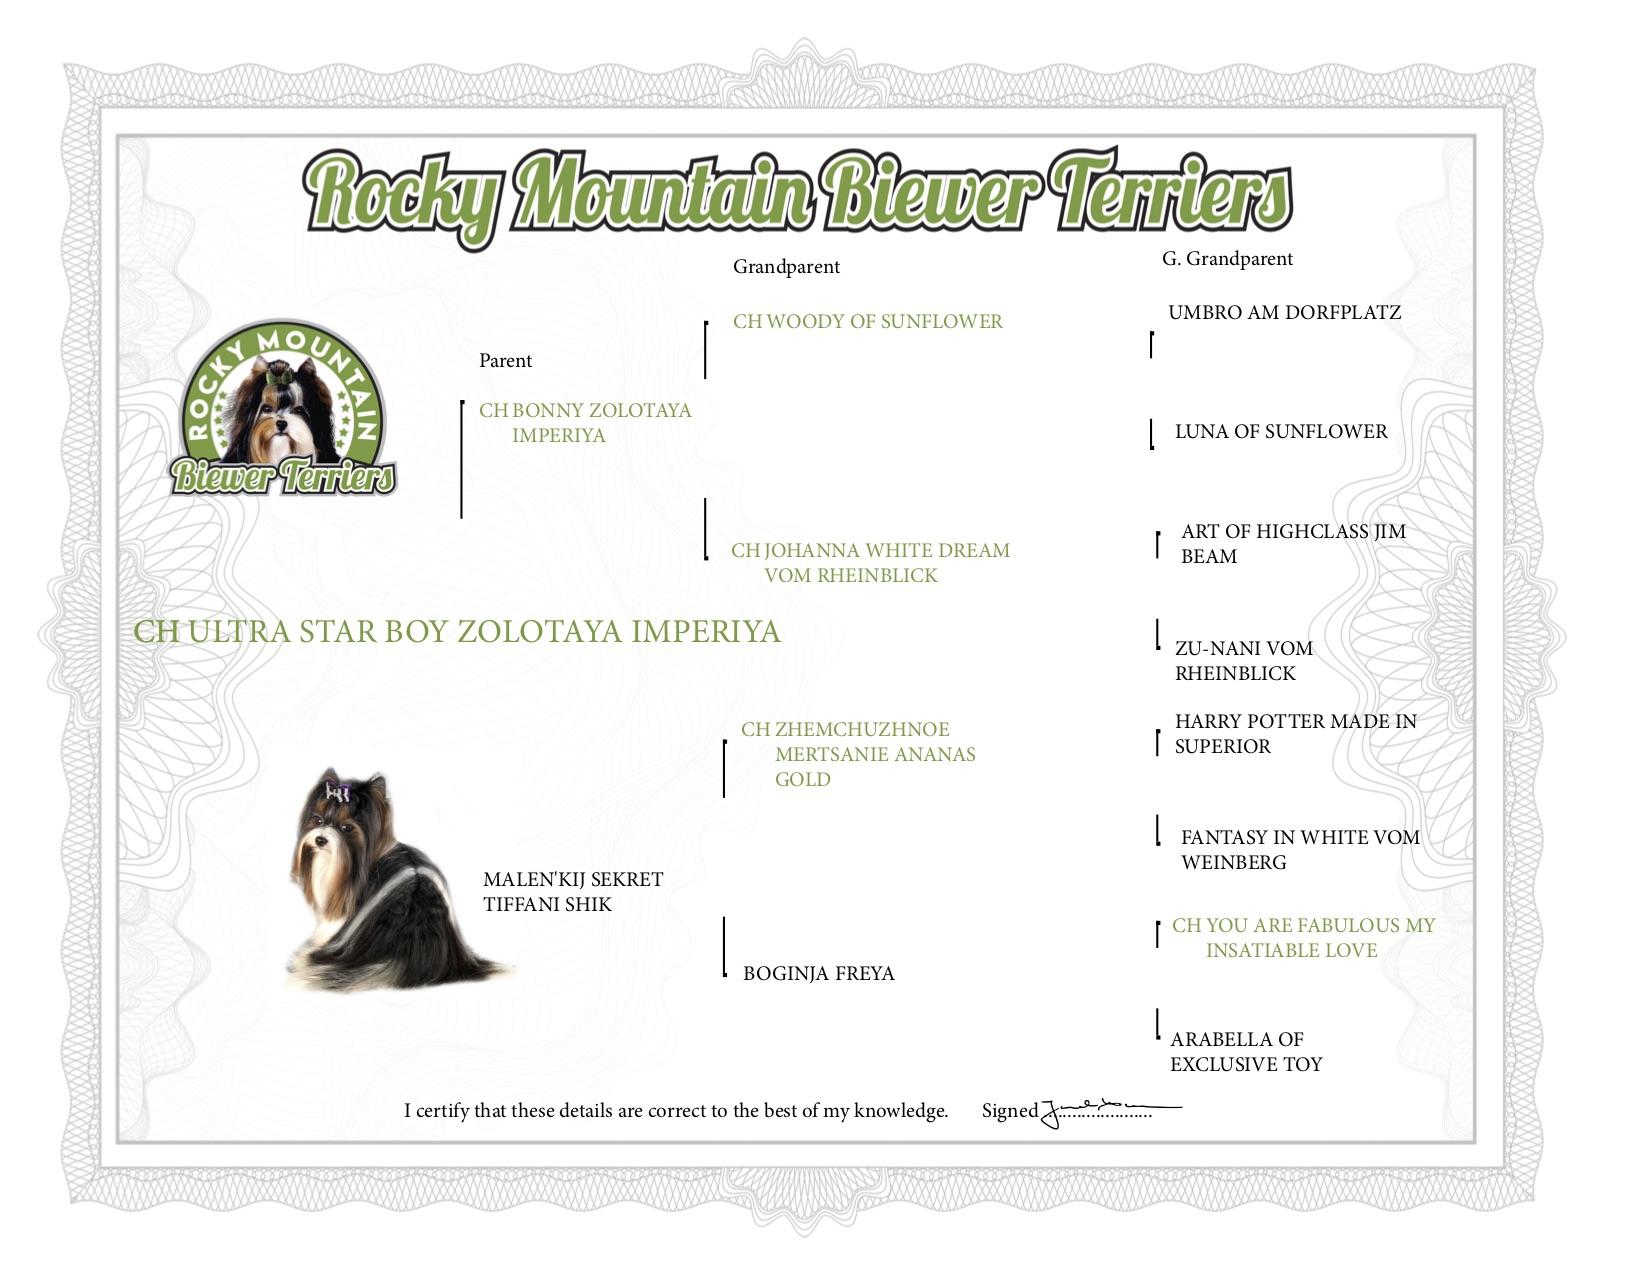 Pedigree of Biewer Terrier Ultra Star Boy Zolotaya Imperiya